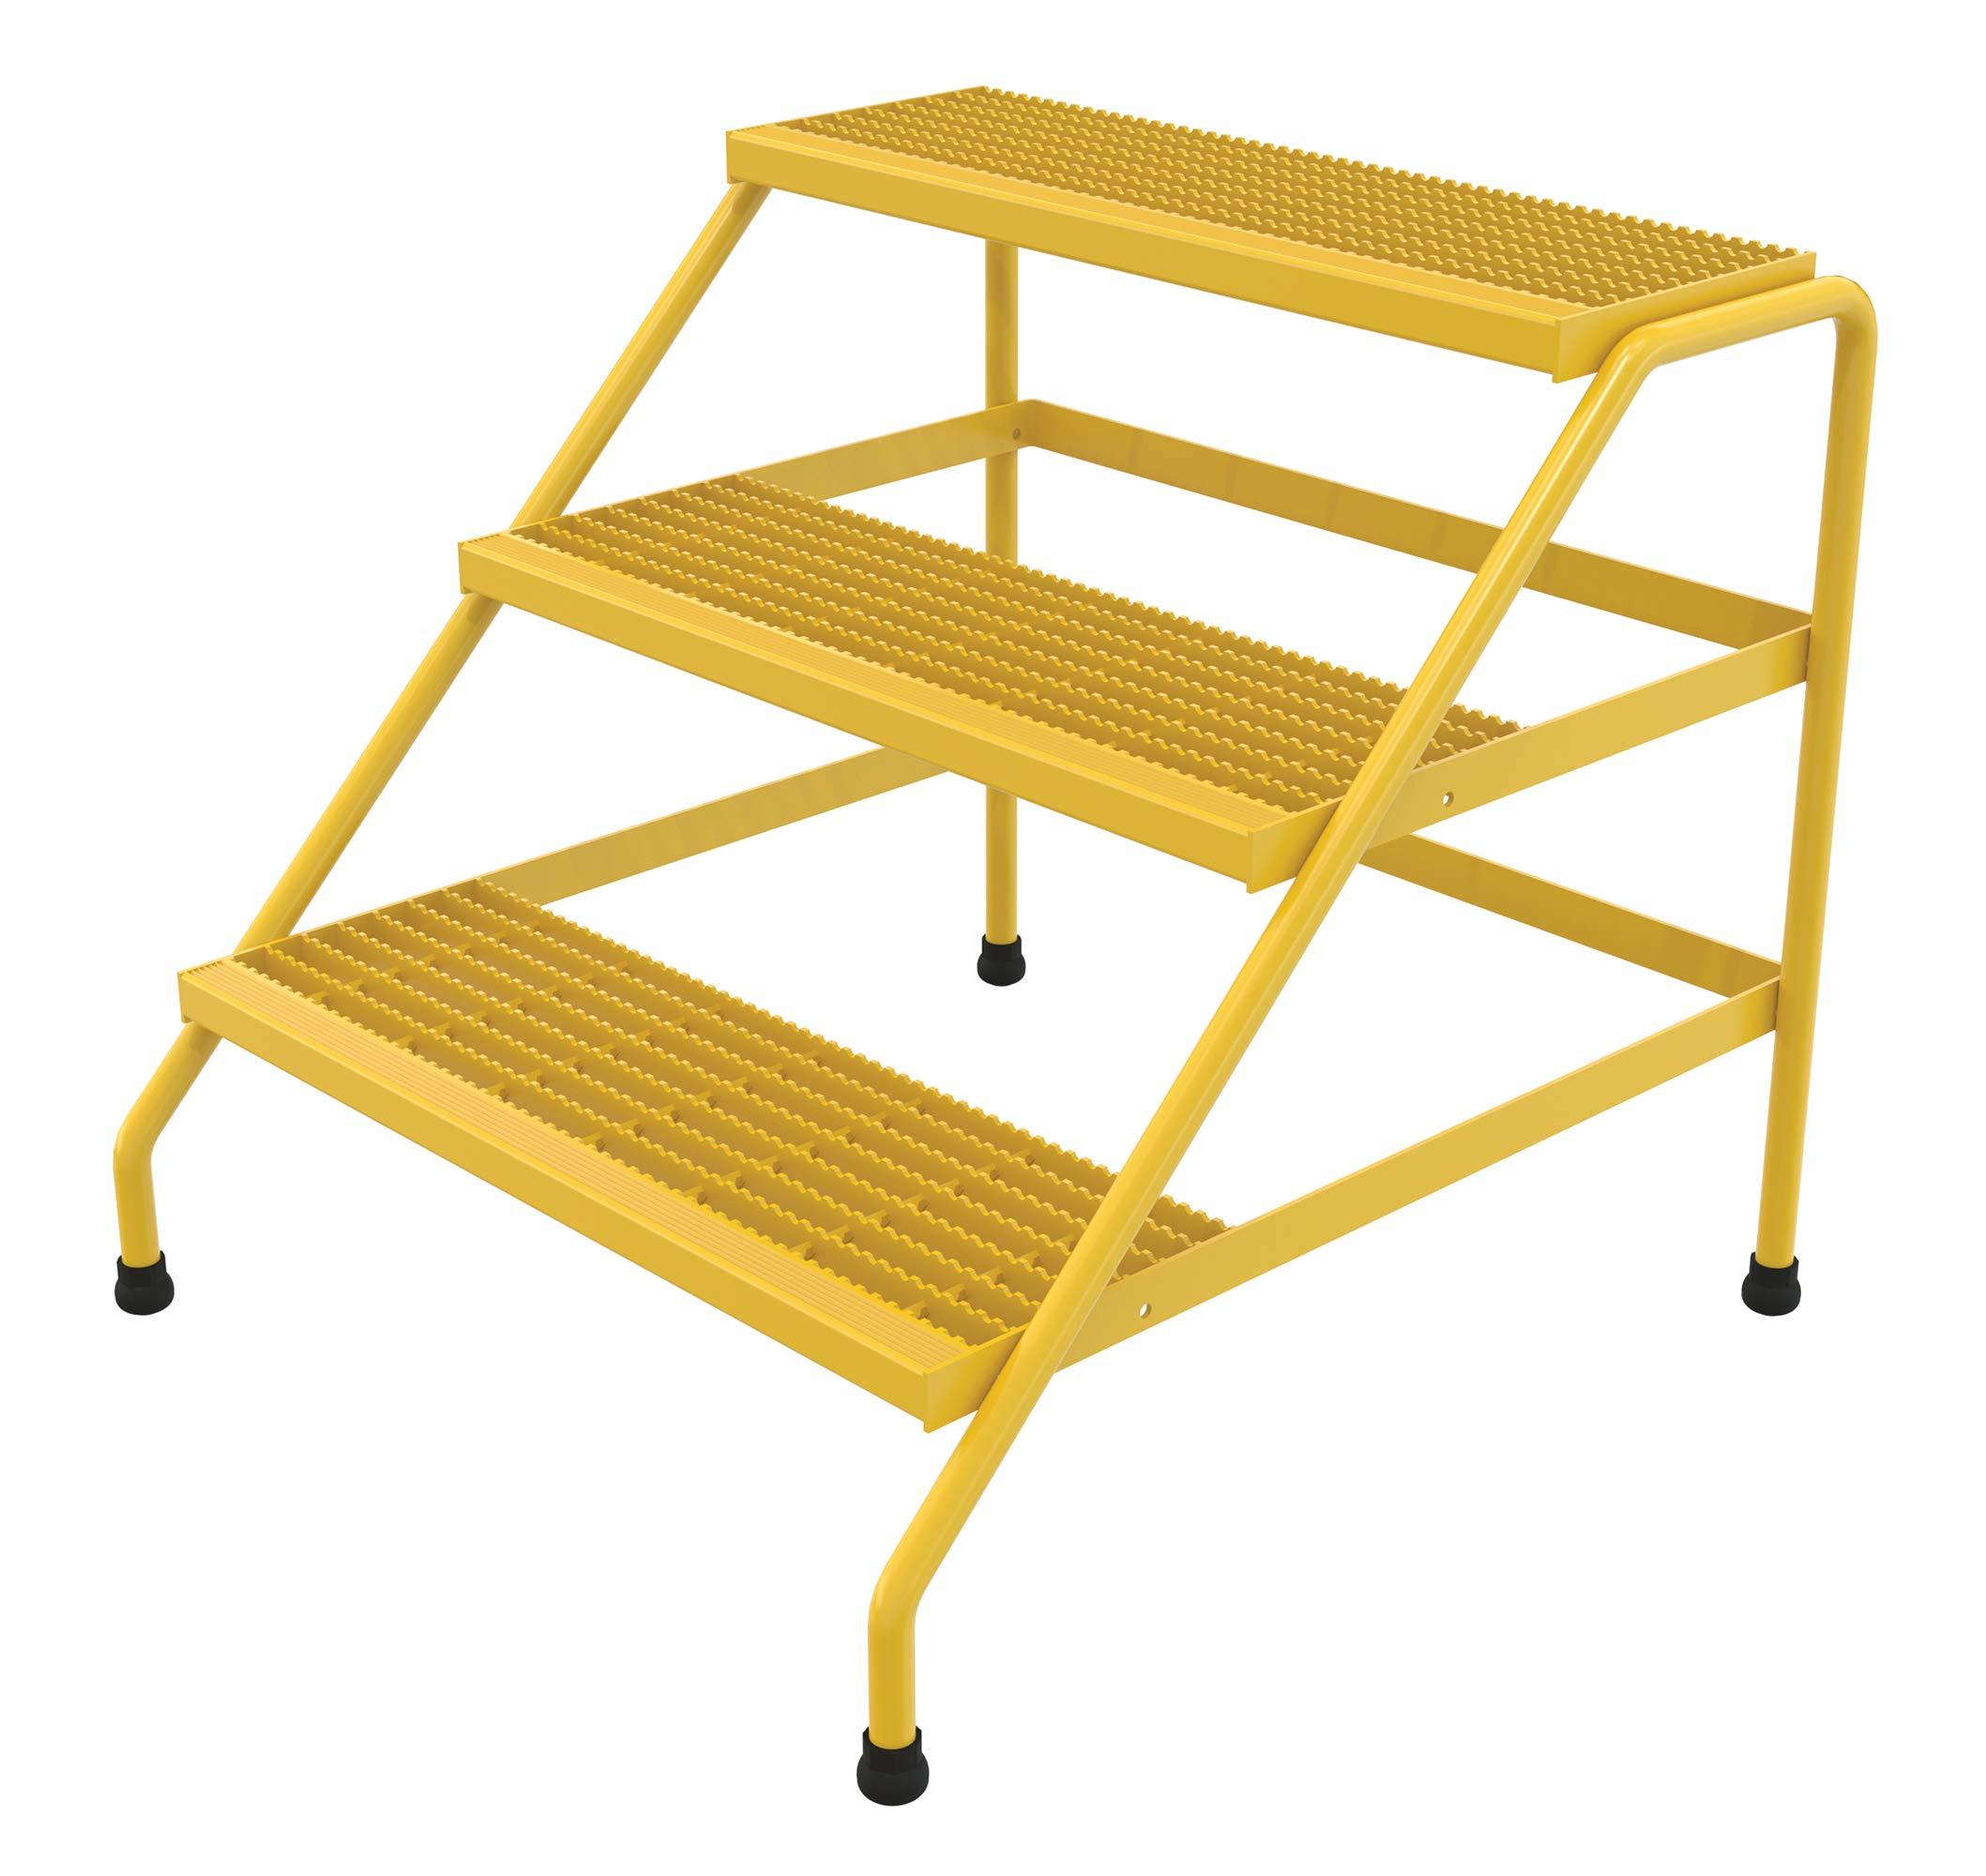 Vestil SSA-3W-Y Aluminum Step Stand, 3 Step Wide Welded, Yellow by Vestil